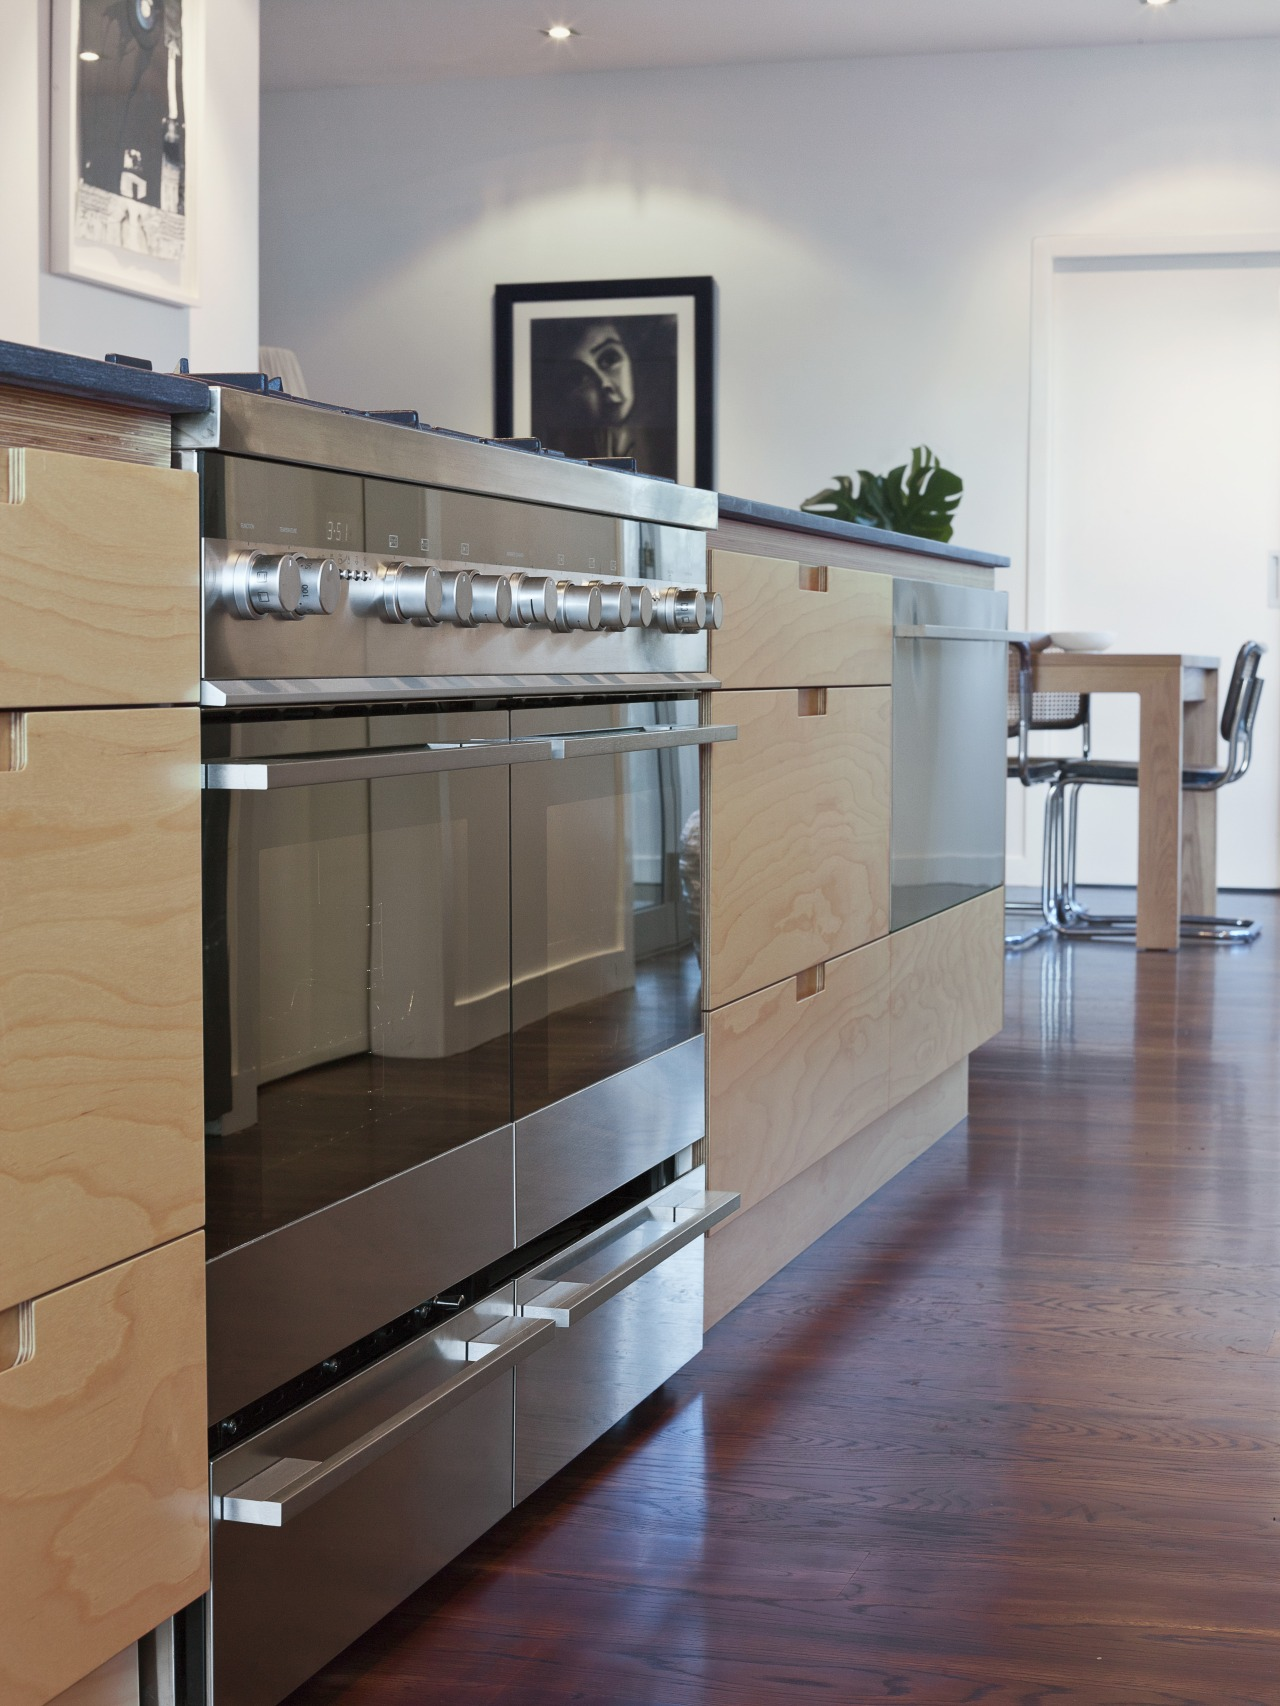 Chefs choice  Natalie Du Bois chooses Fisher cabinetry, countertop, floor, flooring, furniture, glass, hardwood, interior design, kitchen, room, wood, wood flooring, gray